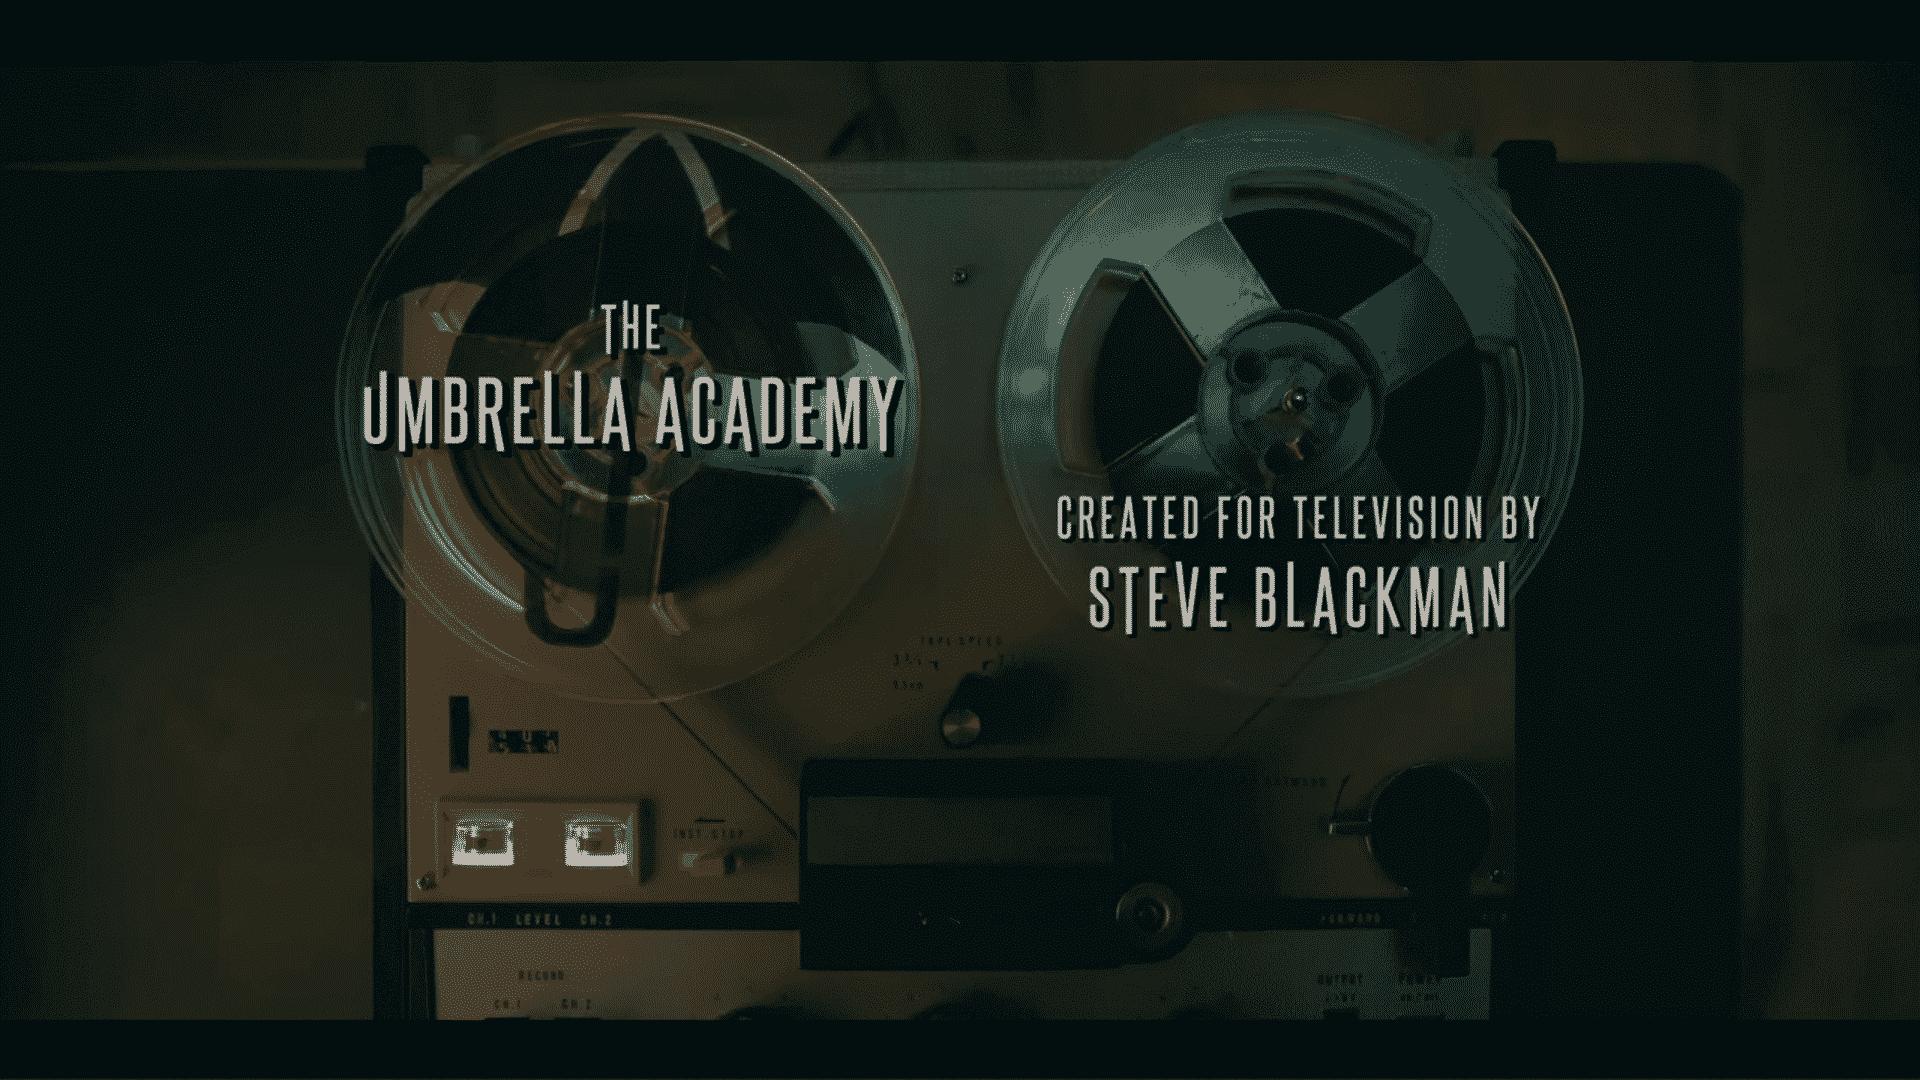 A tape recorder featuring The Umbrella Academy logo